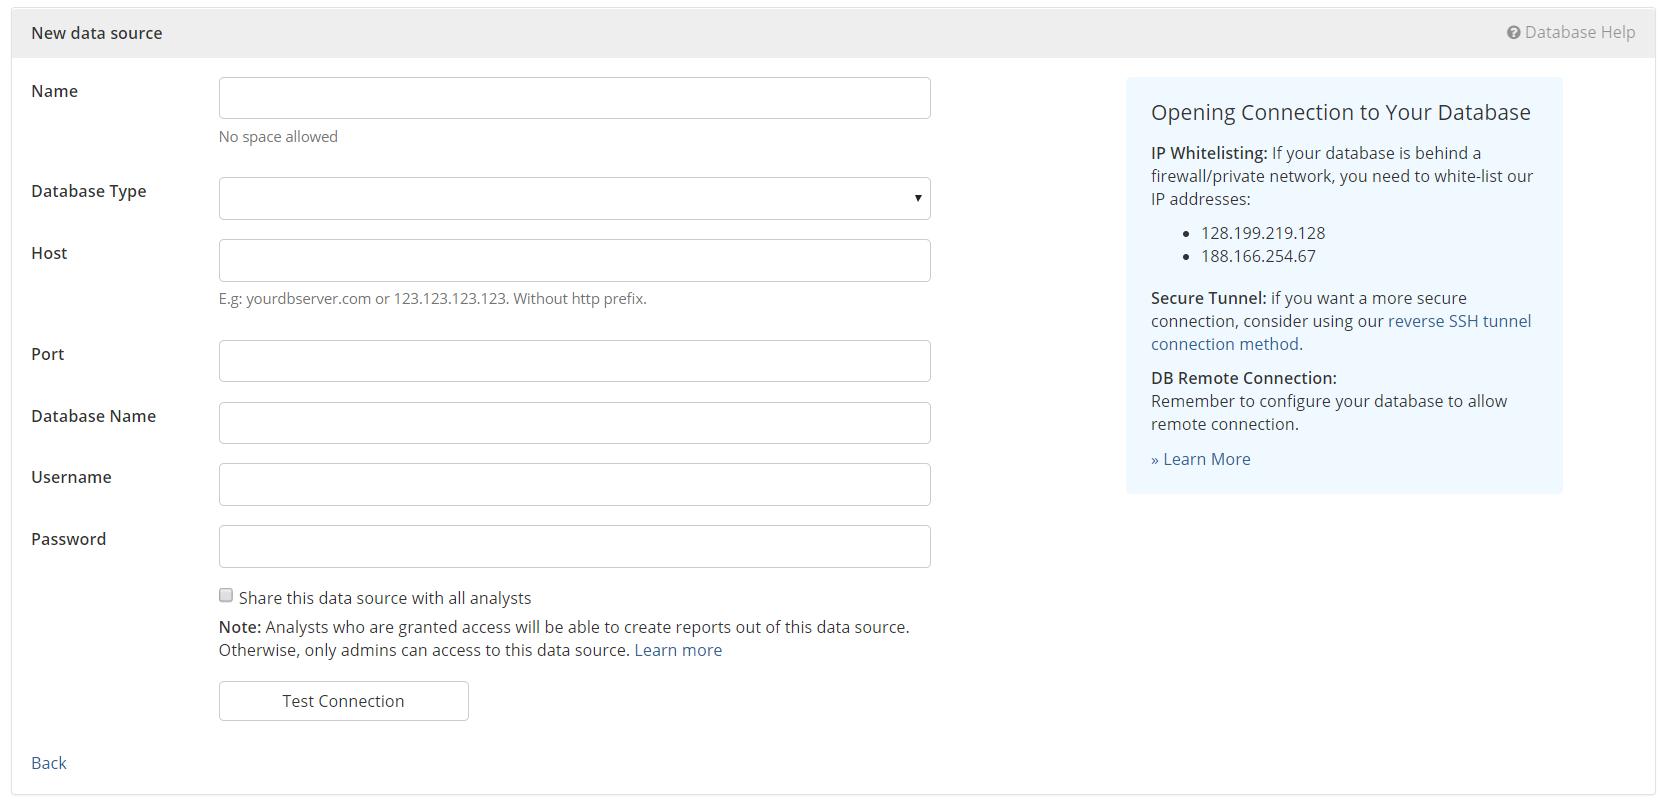 Add new data source ip